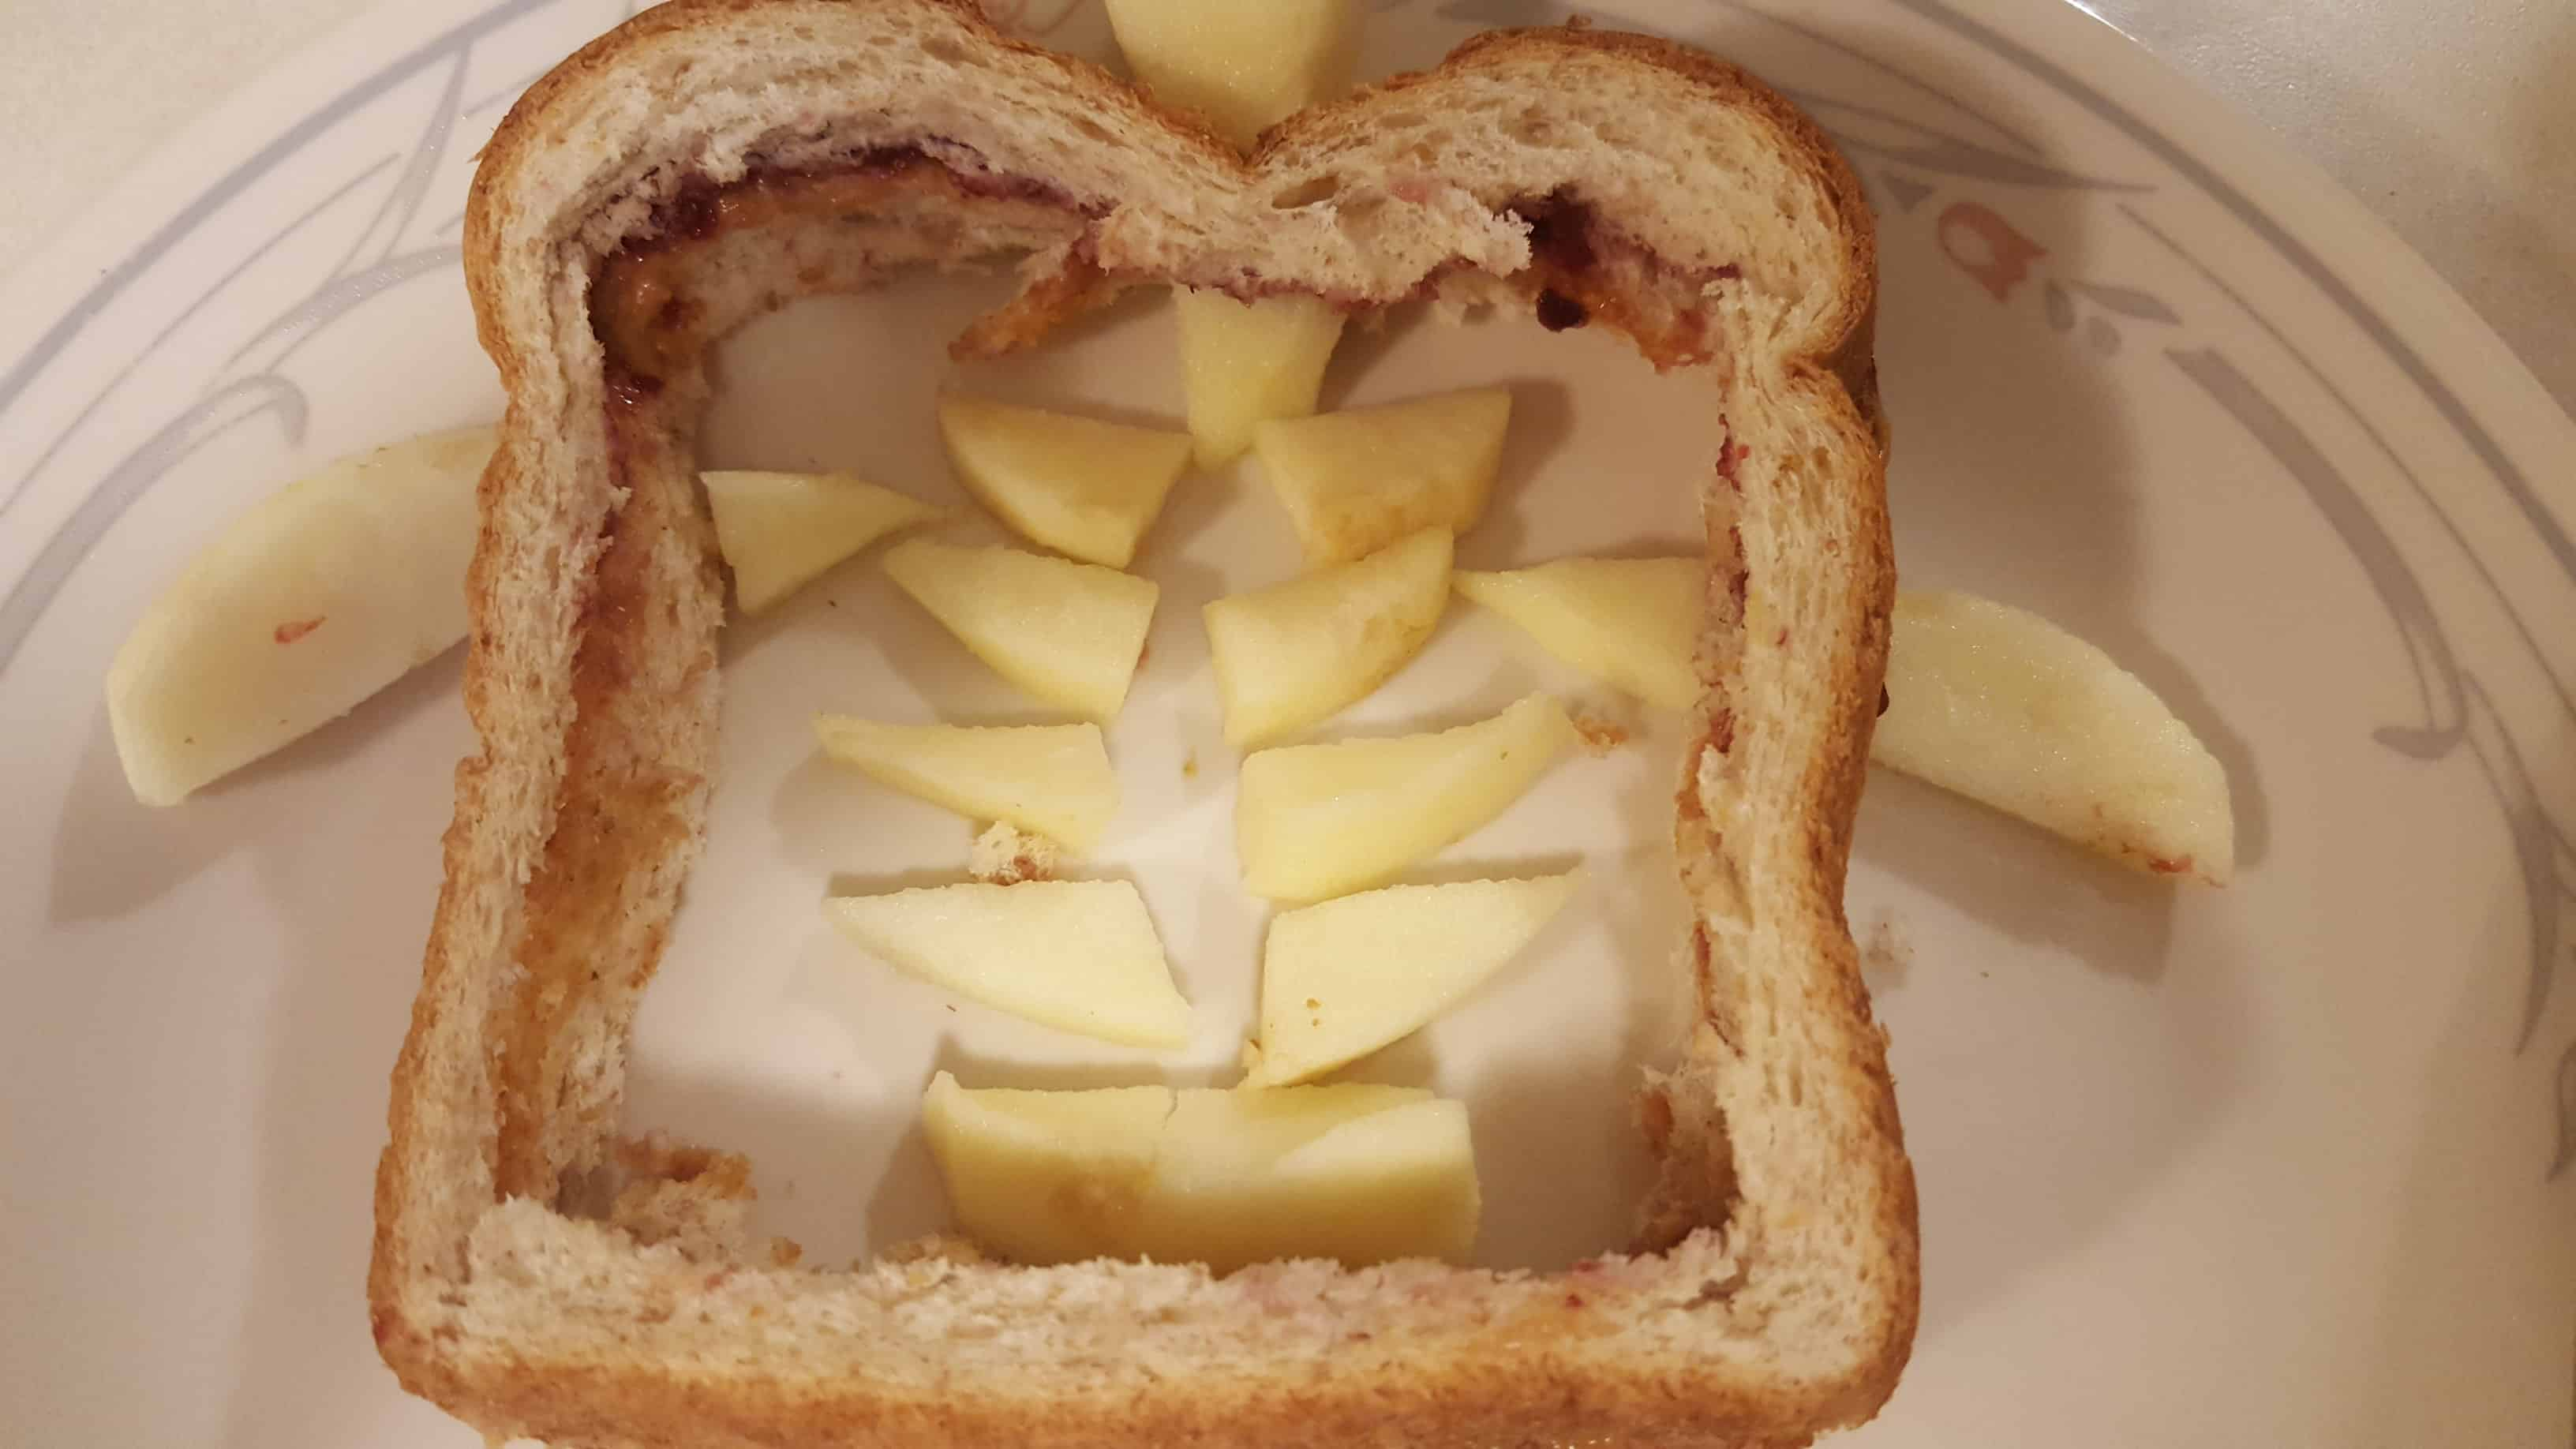 snacks that start with x, letter x snacks, alphabet snacks, snacks for kids, healthy snacks, healthy snacks for kids